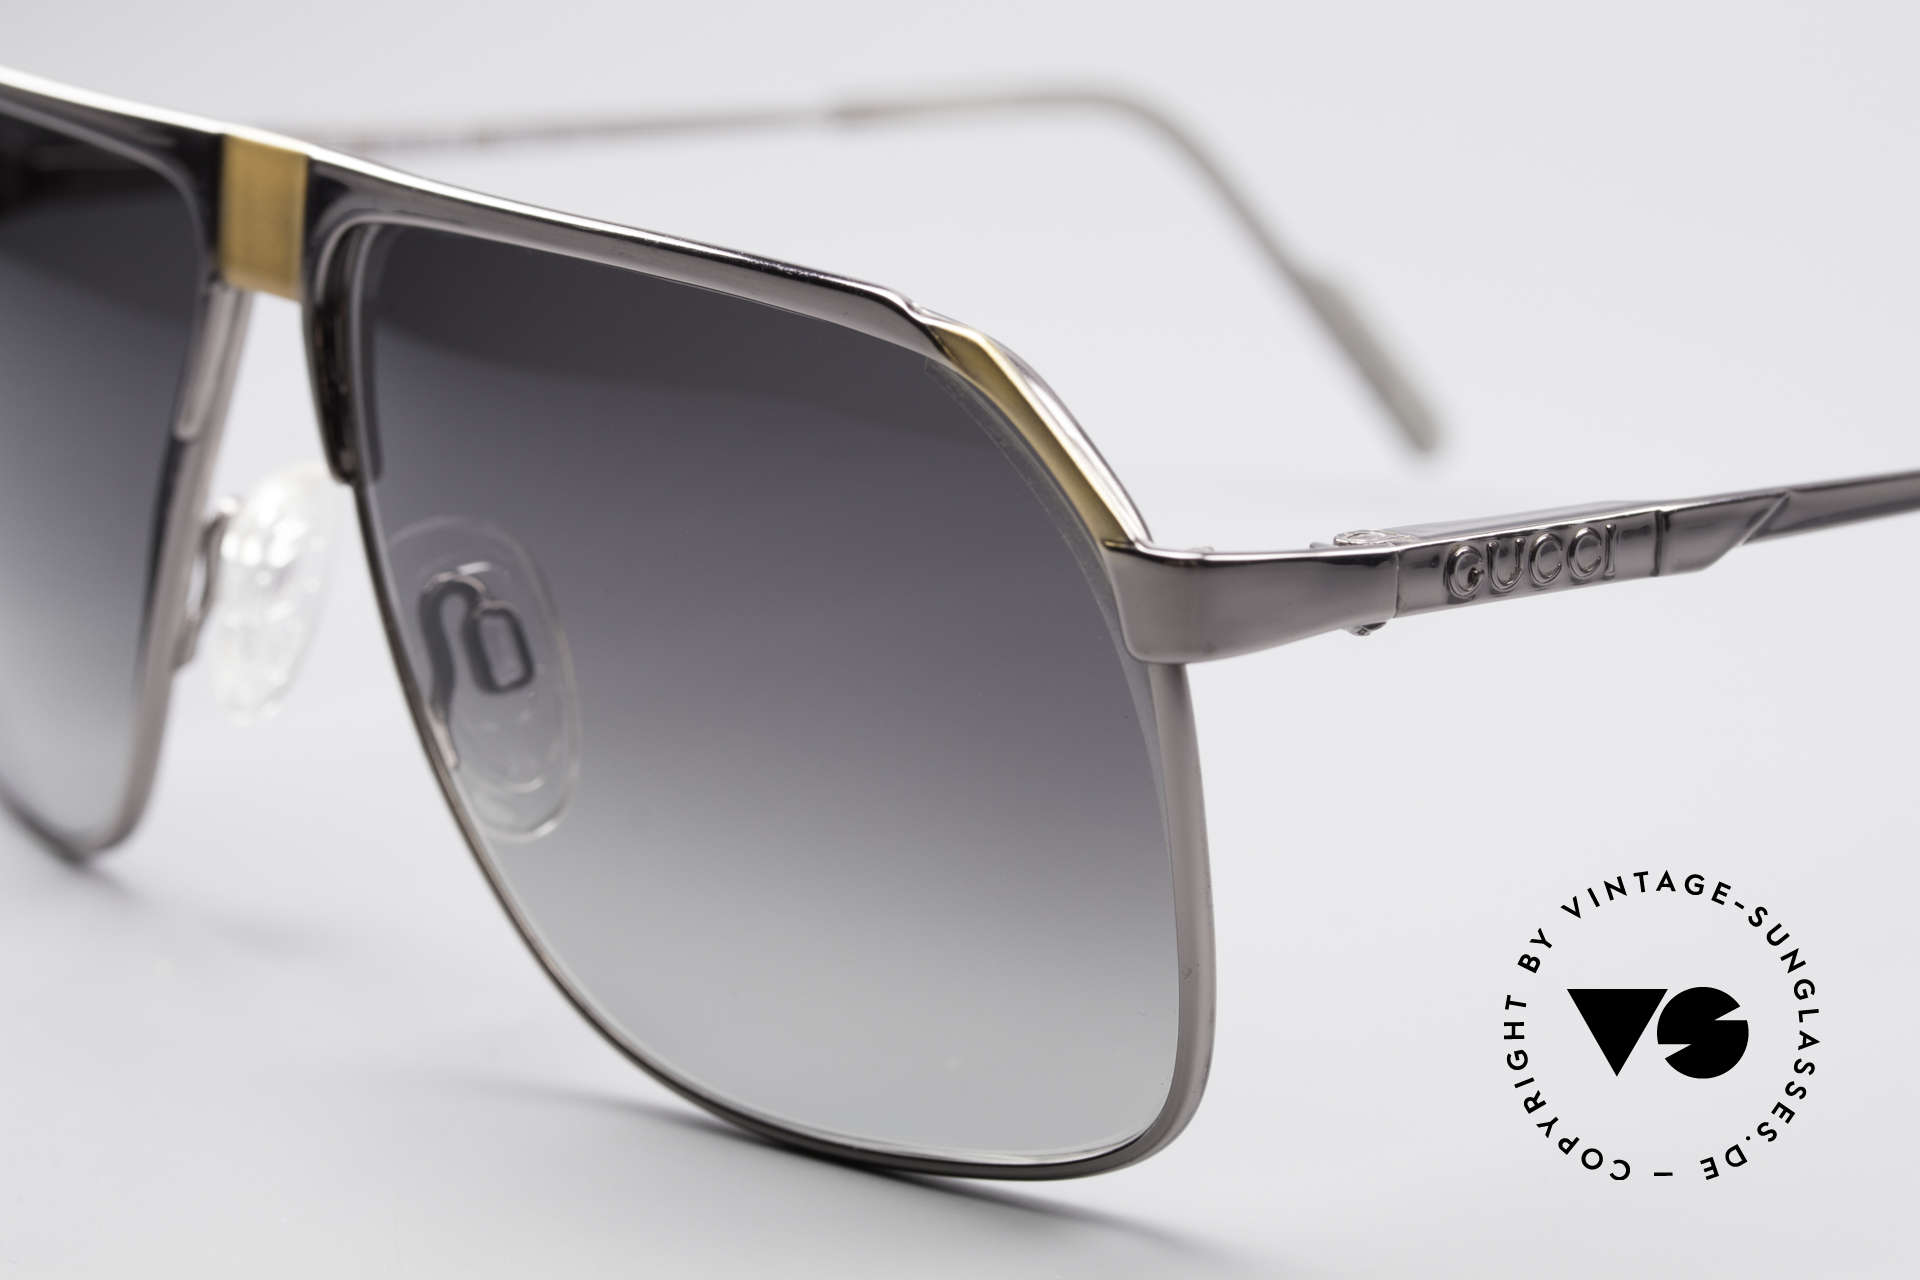 Gucci 1200 80's Luxury Sunglasses, unworn with gray-gradient sun lenses; 100% UV, Made for Men